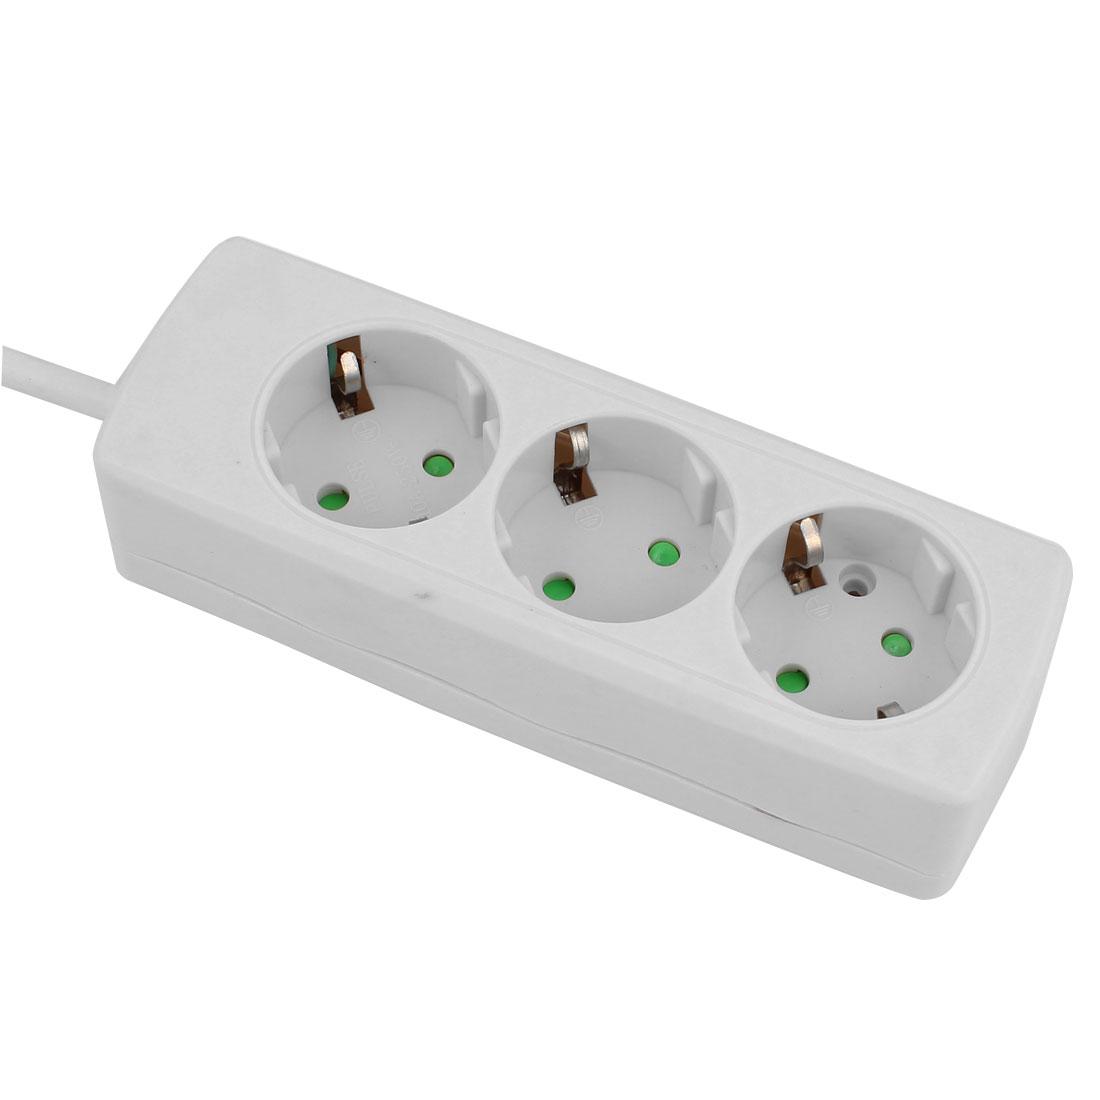 AC 250V EU Plug 2.5 Meters Extension Cable 3 EU Socket Strip Power Outlet Bar